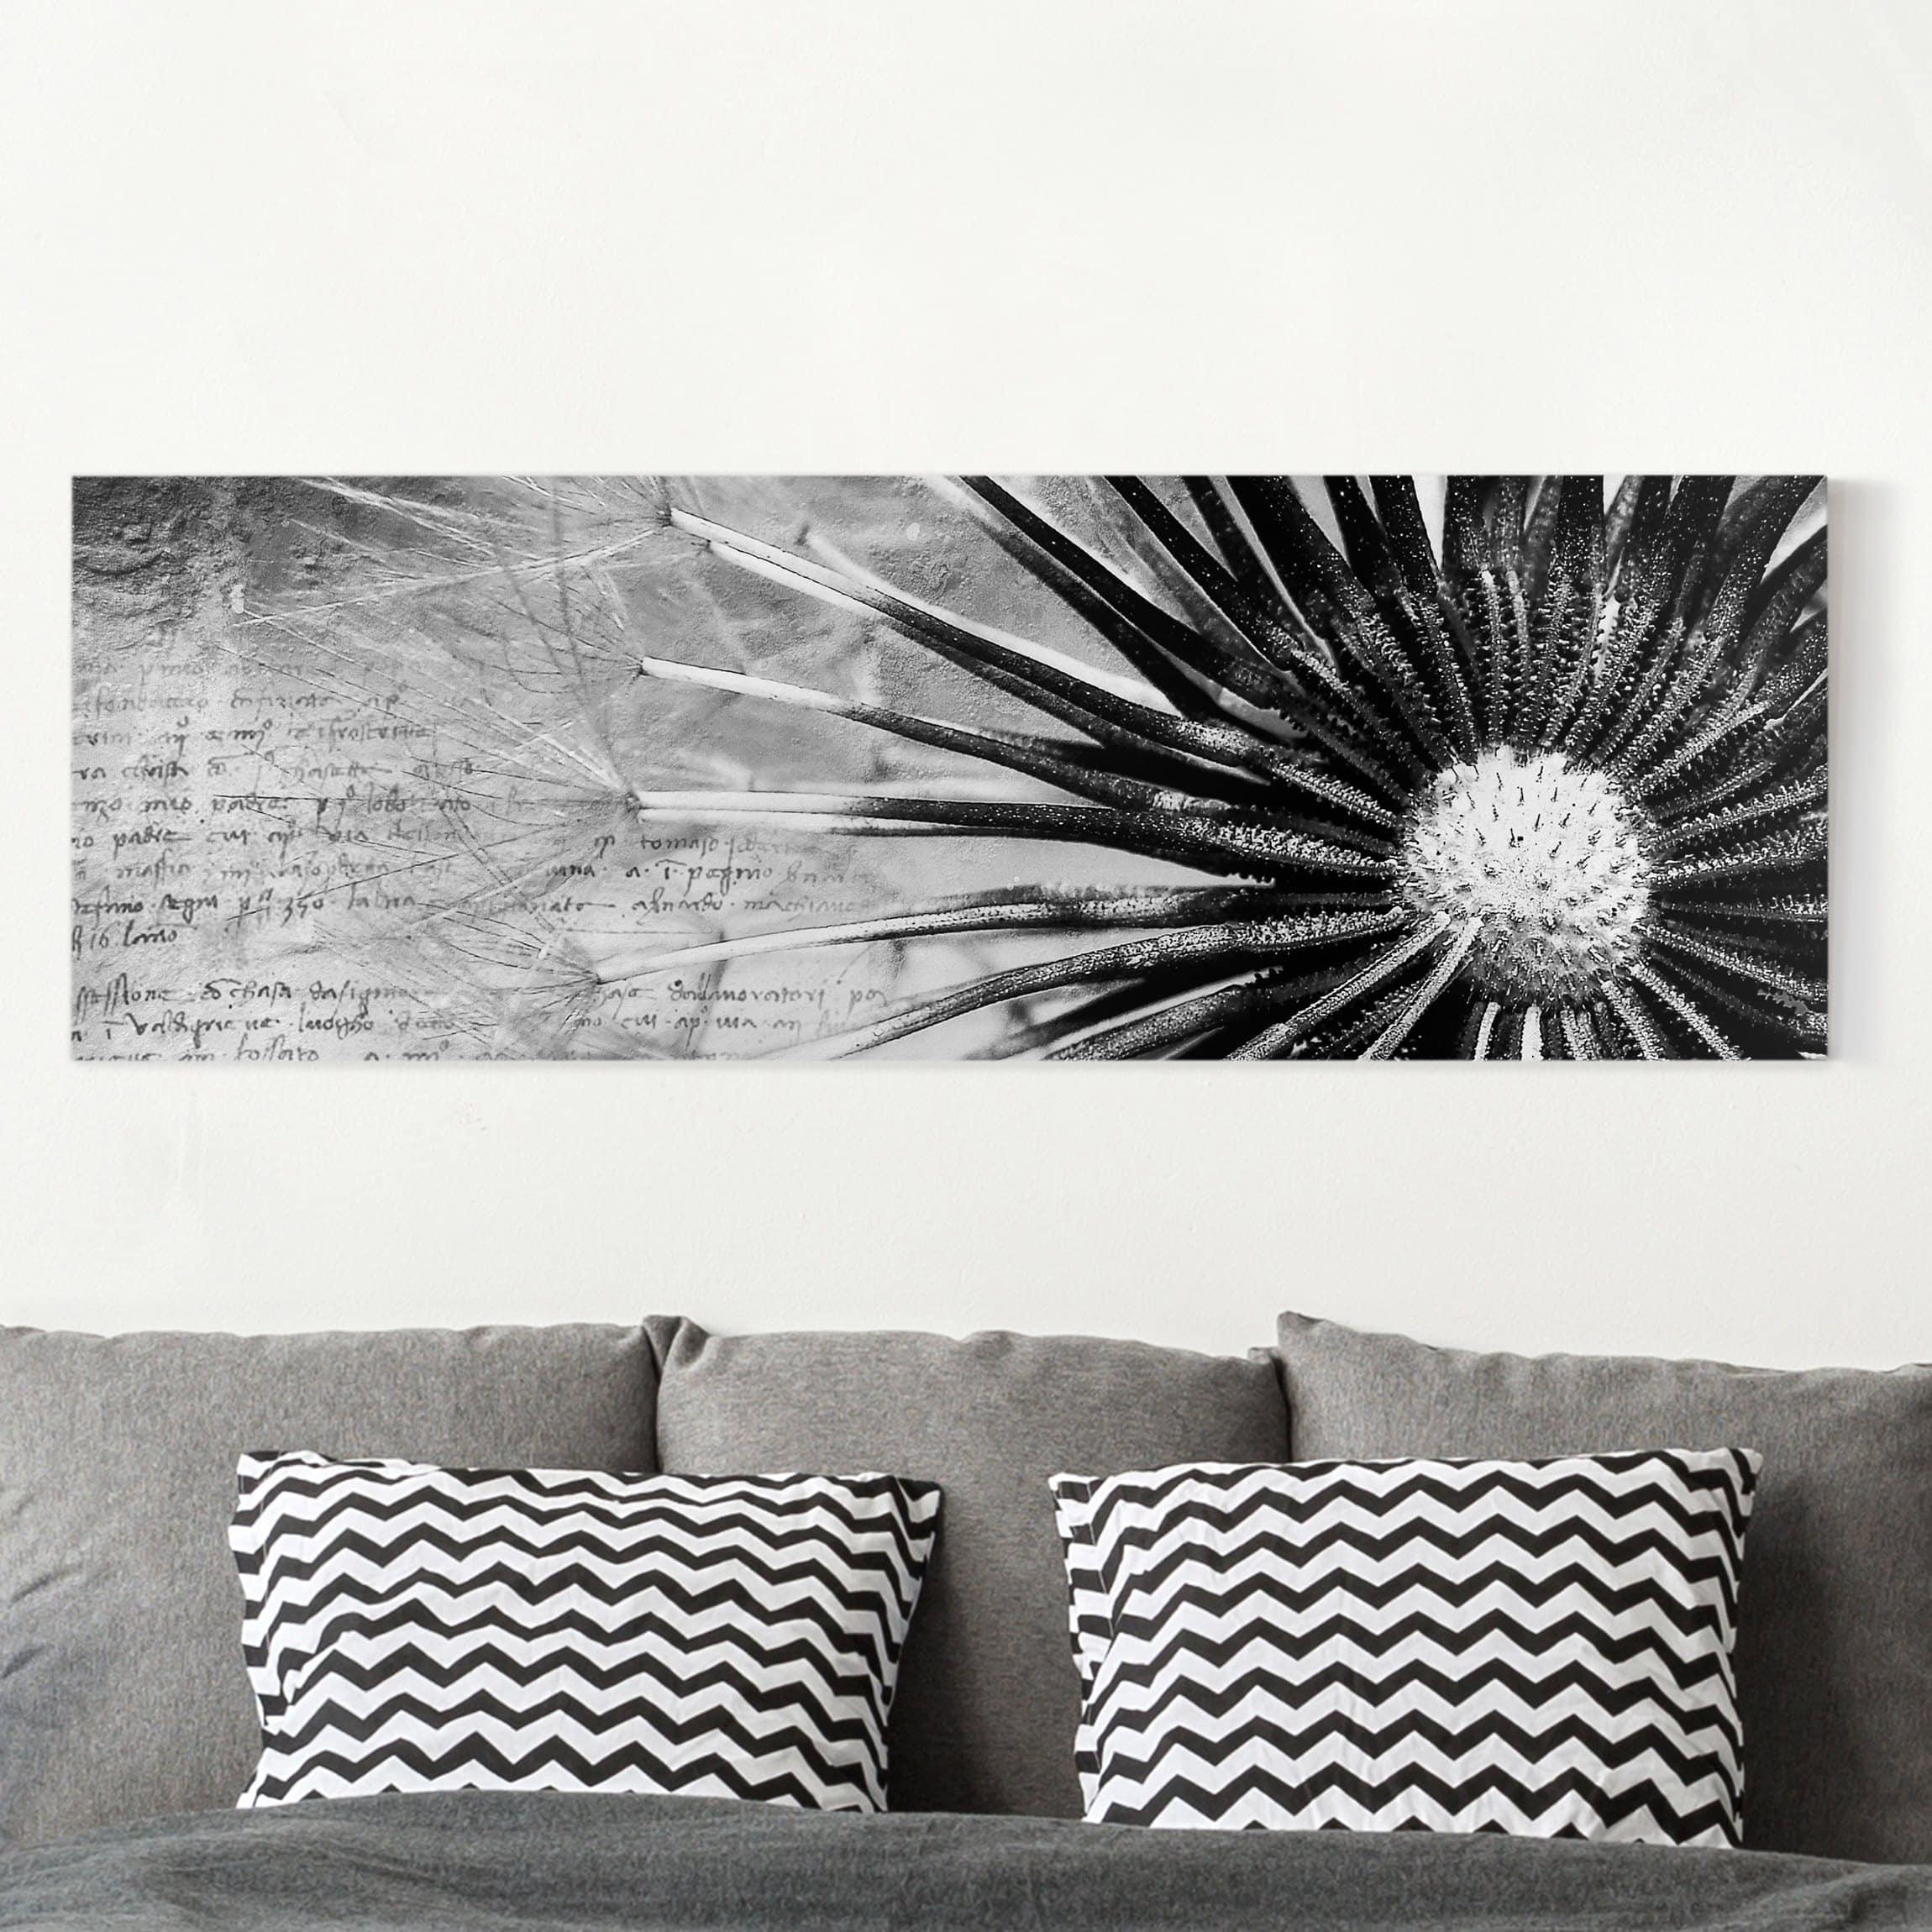 leinwandbild schwarz wei pusteblume schwarz wei panoramabild quer. Black Bedroom Furniture Sets. Home Design Ideas